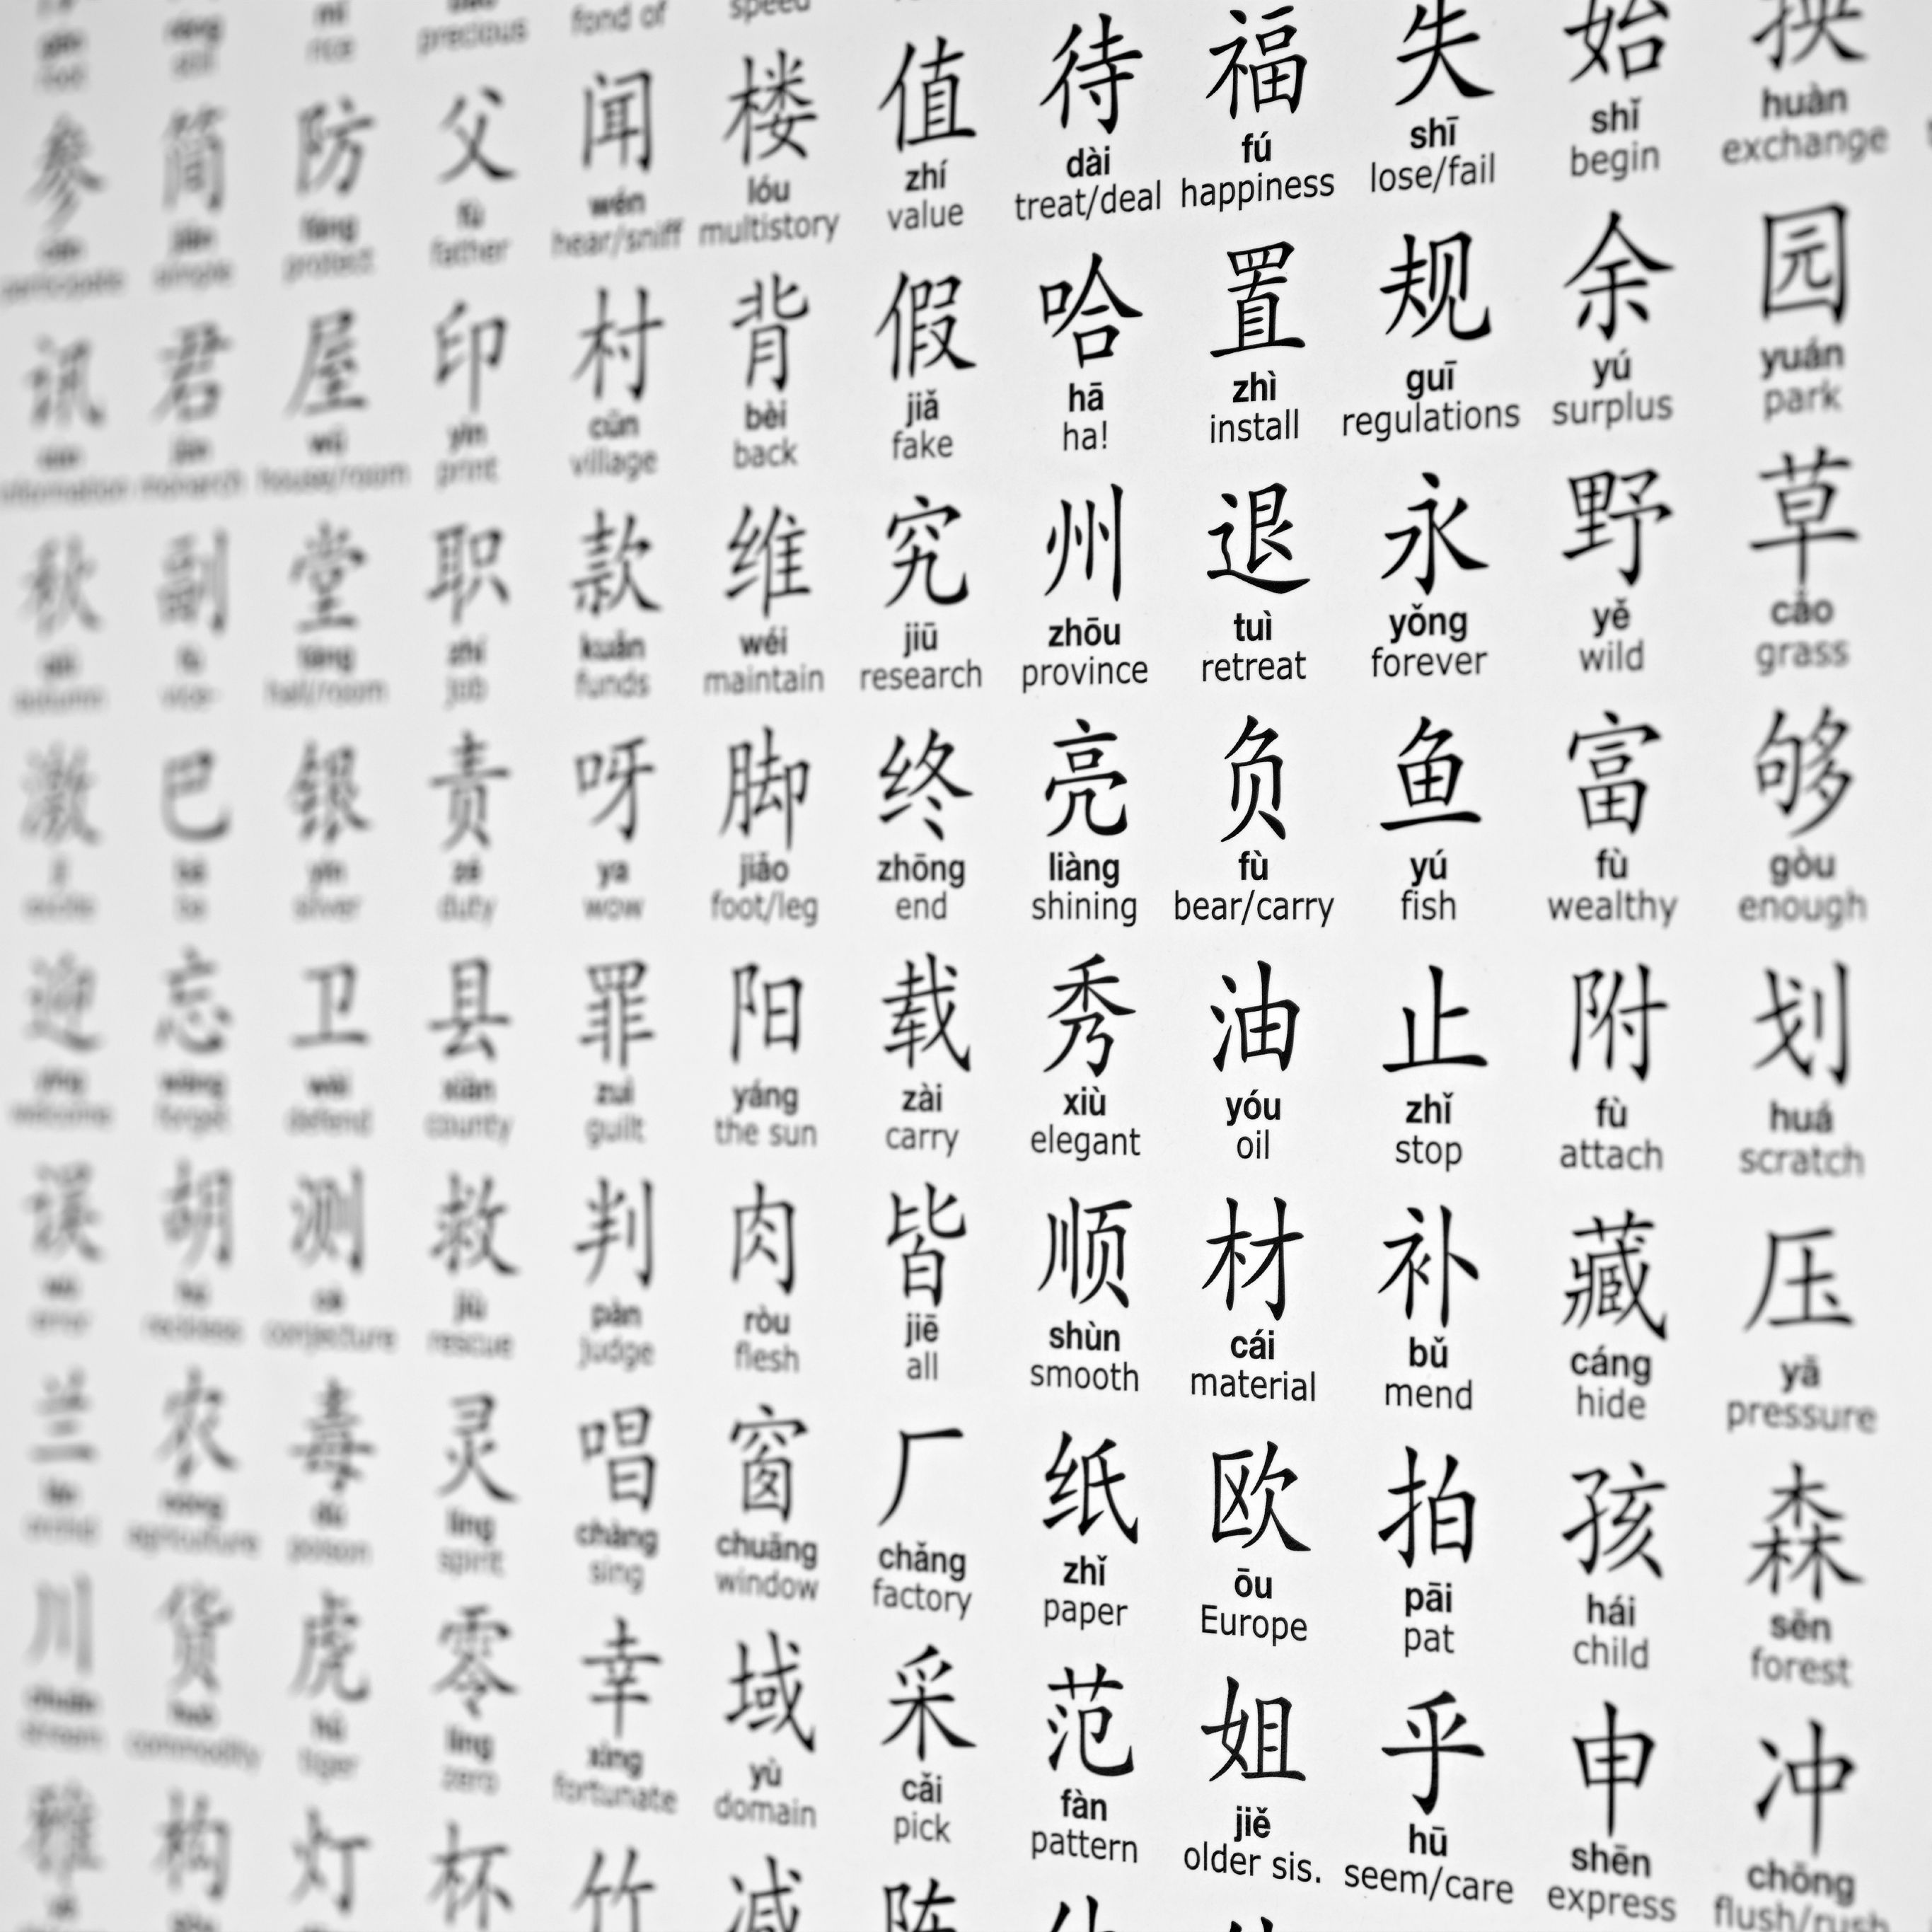 learn mandarin chinese with pinyin romanization learn mandarin chinese with pinyin